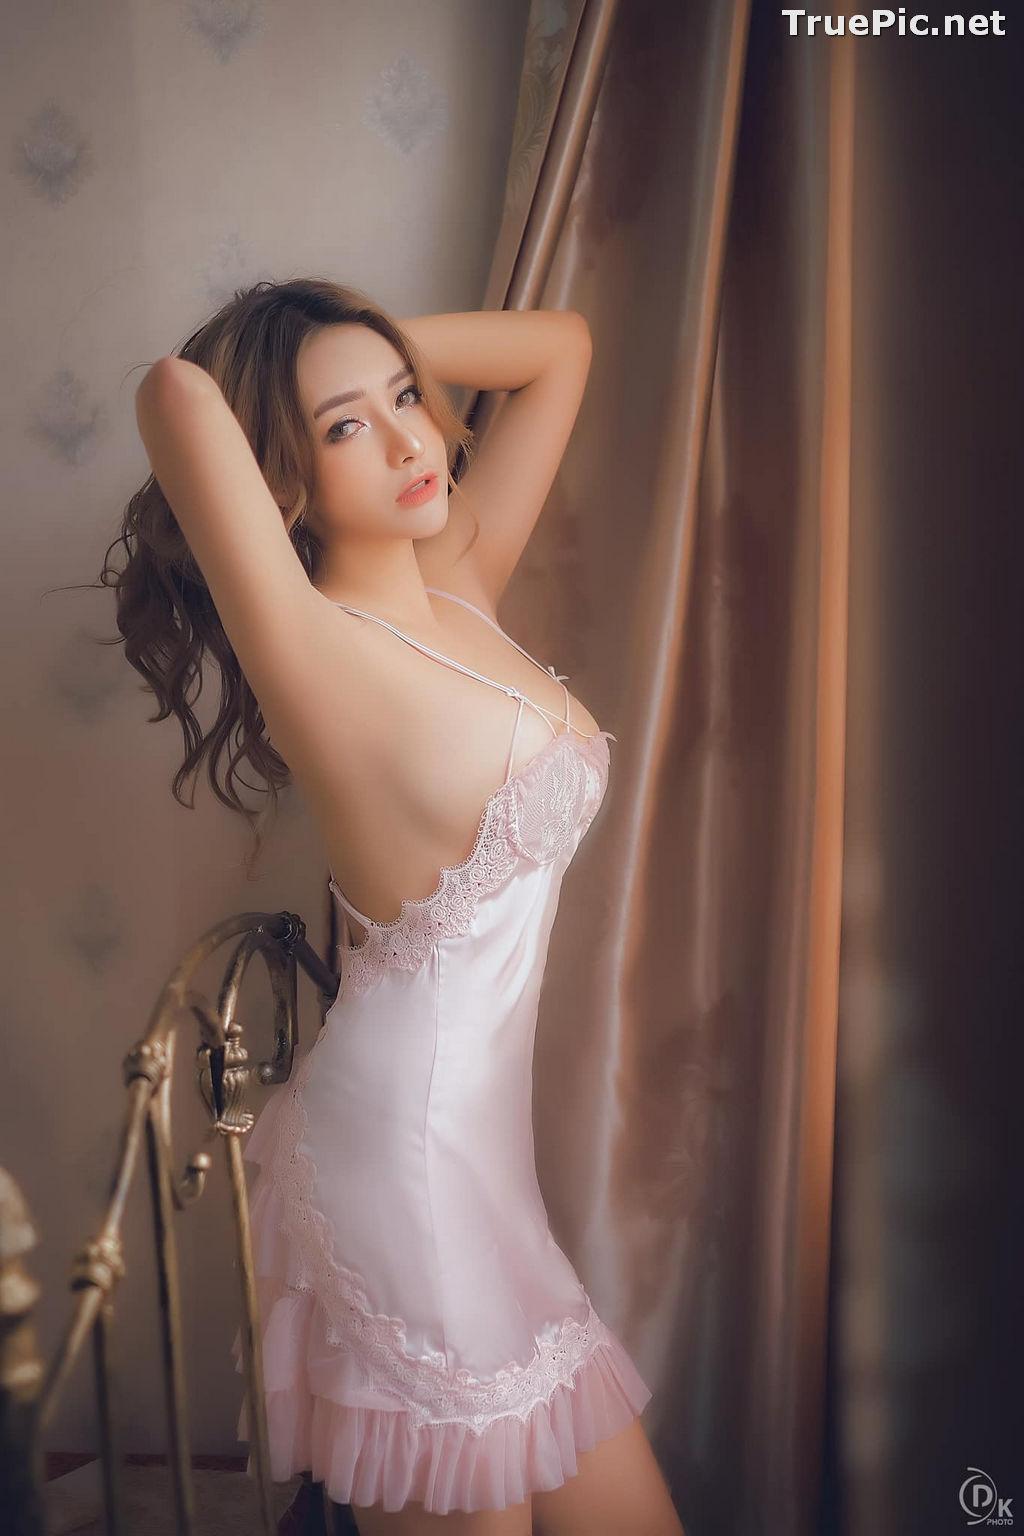 Hot are vietnamese girls Top 15